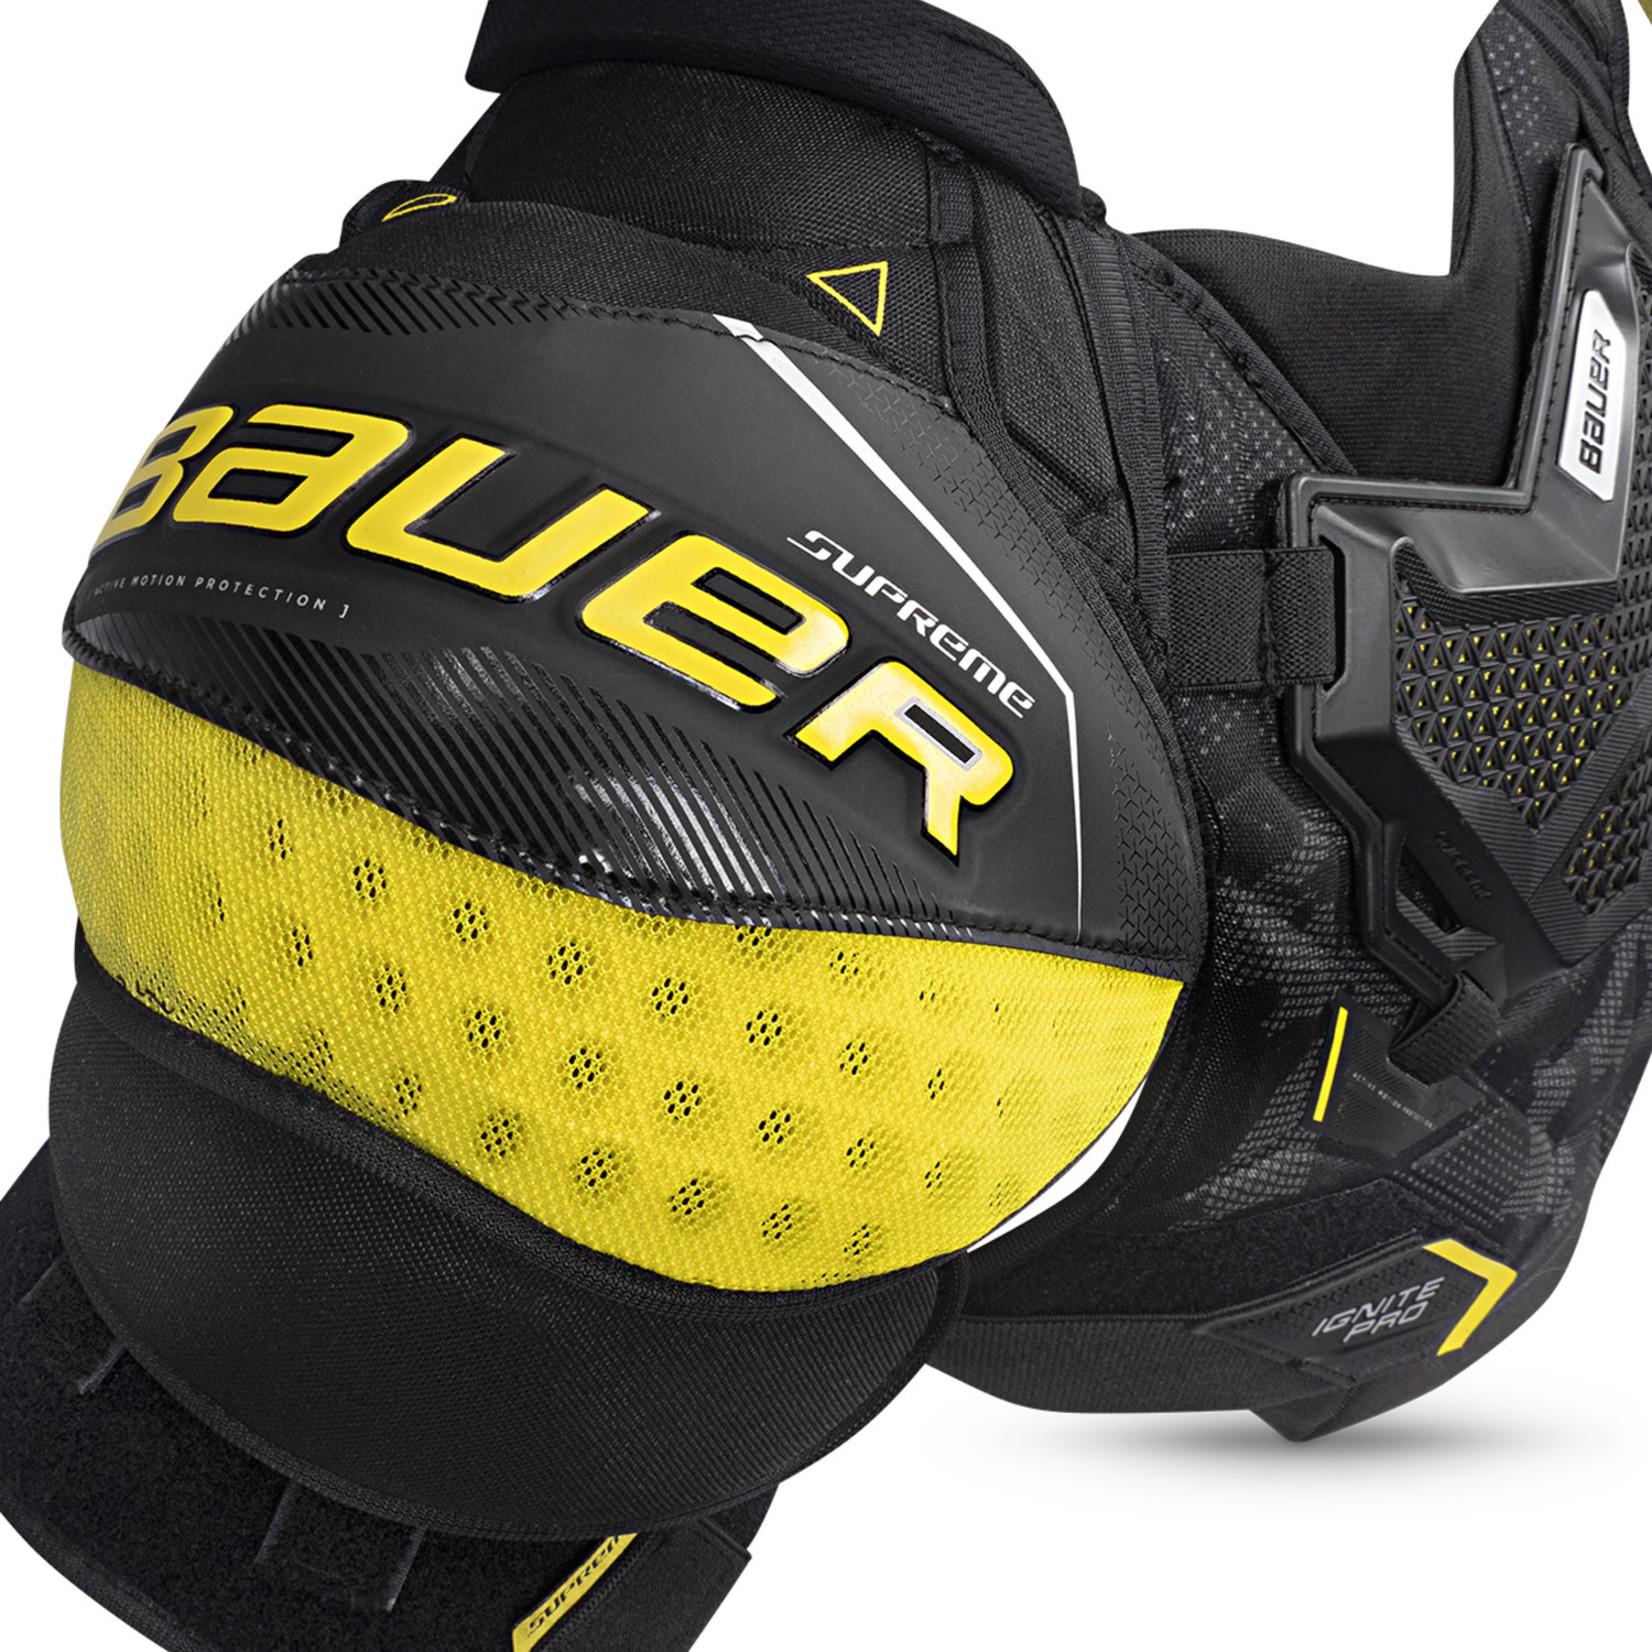 Bauer Bauer Hockey Shoulder Pads, Supreme Ignite Pro, Senior